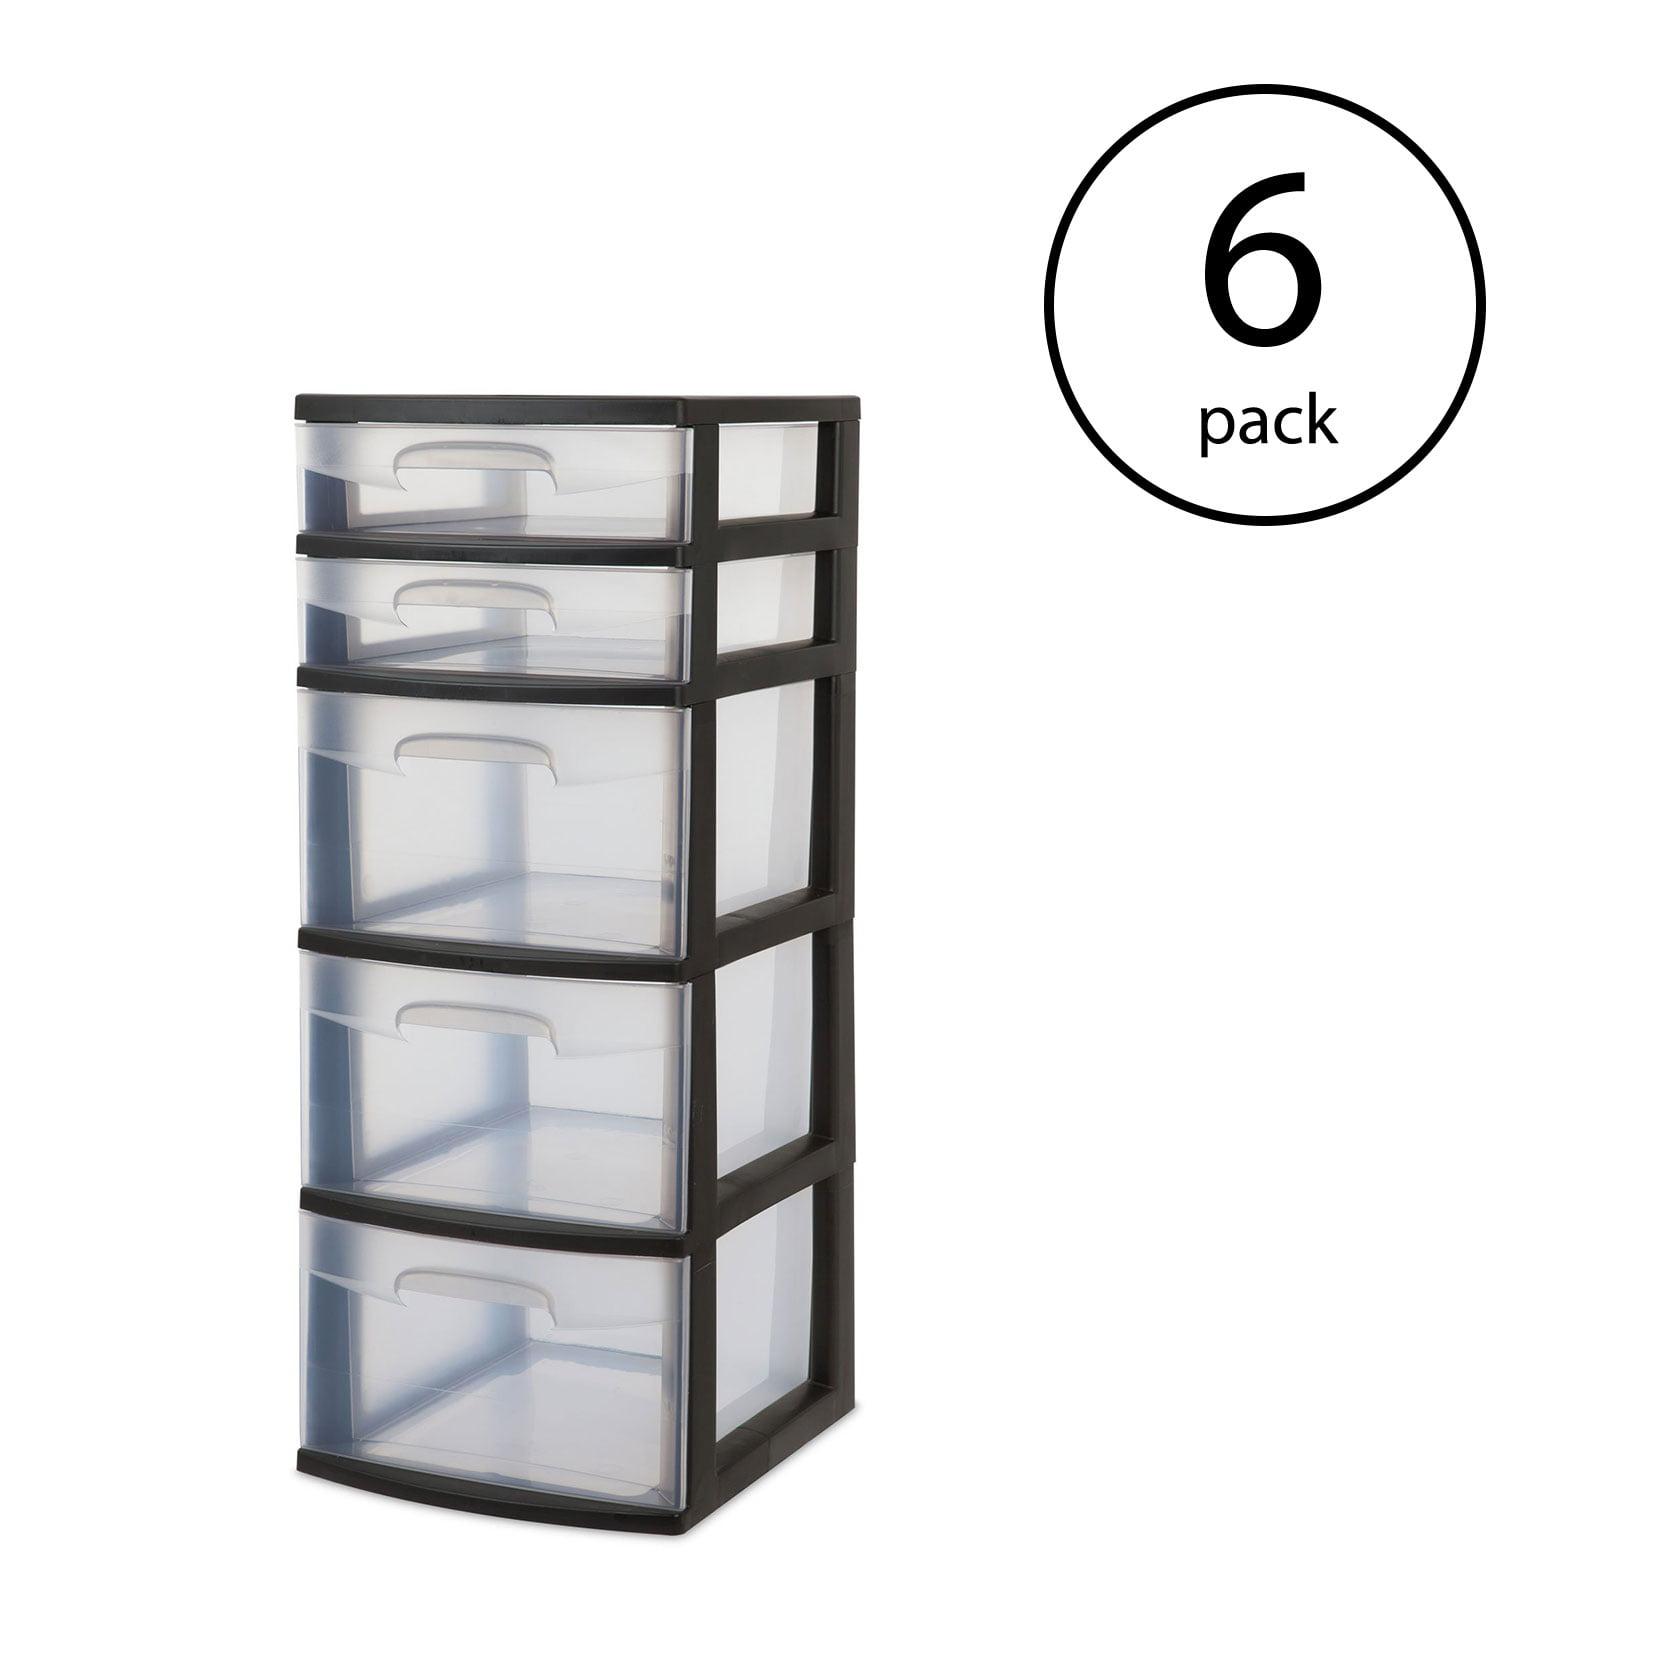 Sterilite 5 Drawer Tower Plastic Space Saving Home Storage Organizer (6 Pack) by Sterilite